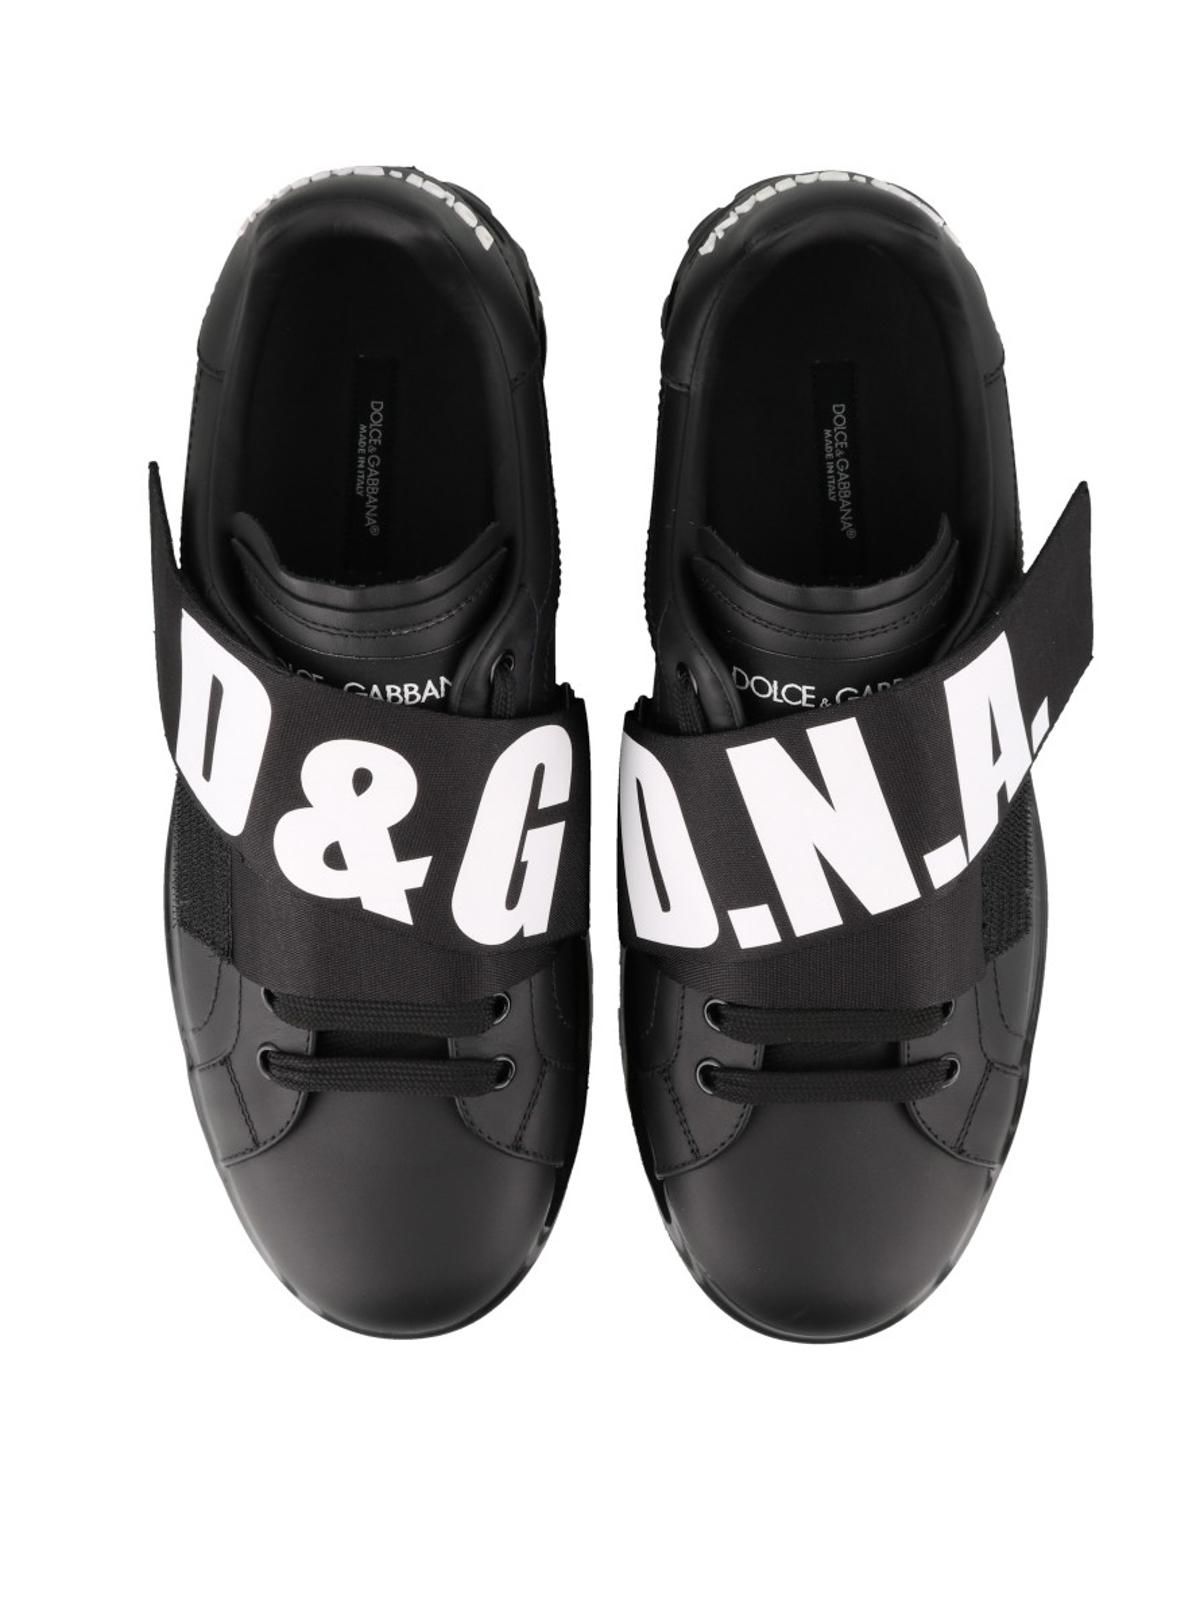 Dolce \u0026 Gabbana - Portofino Melt black